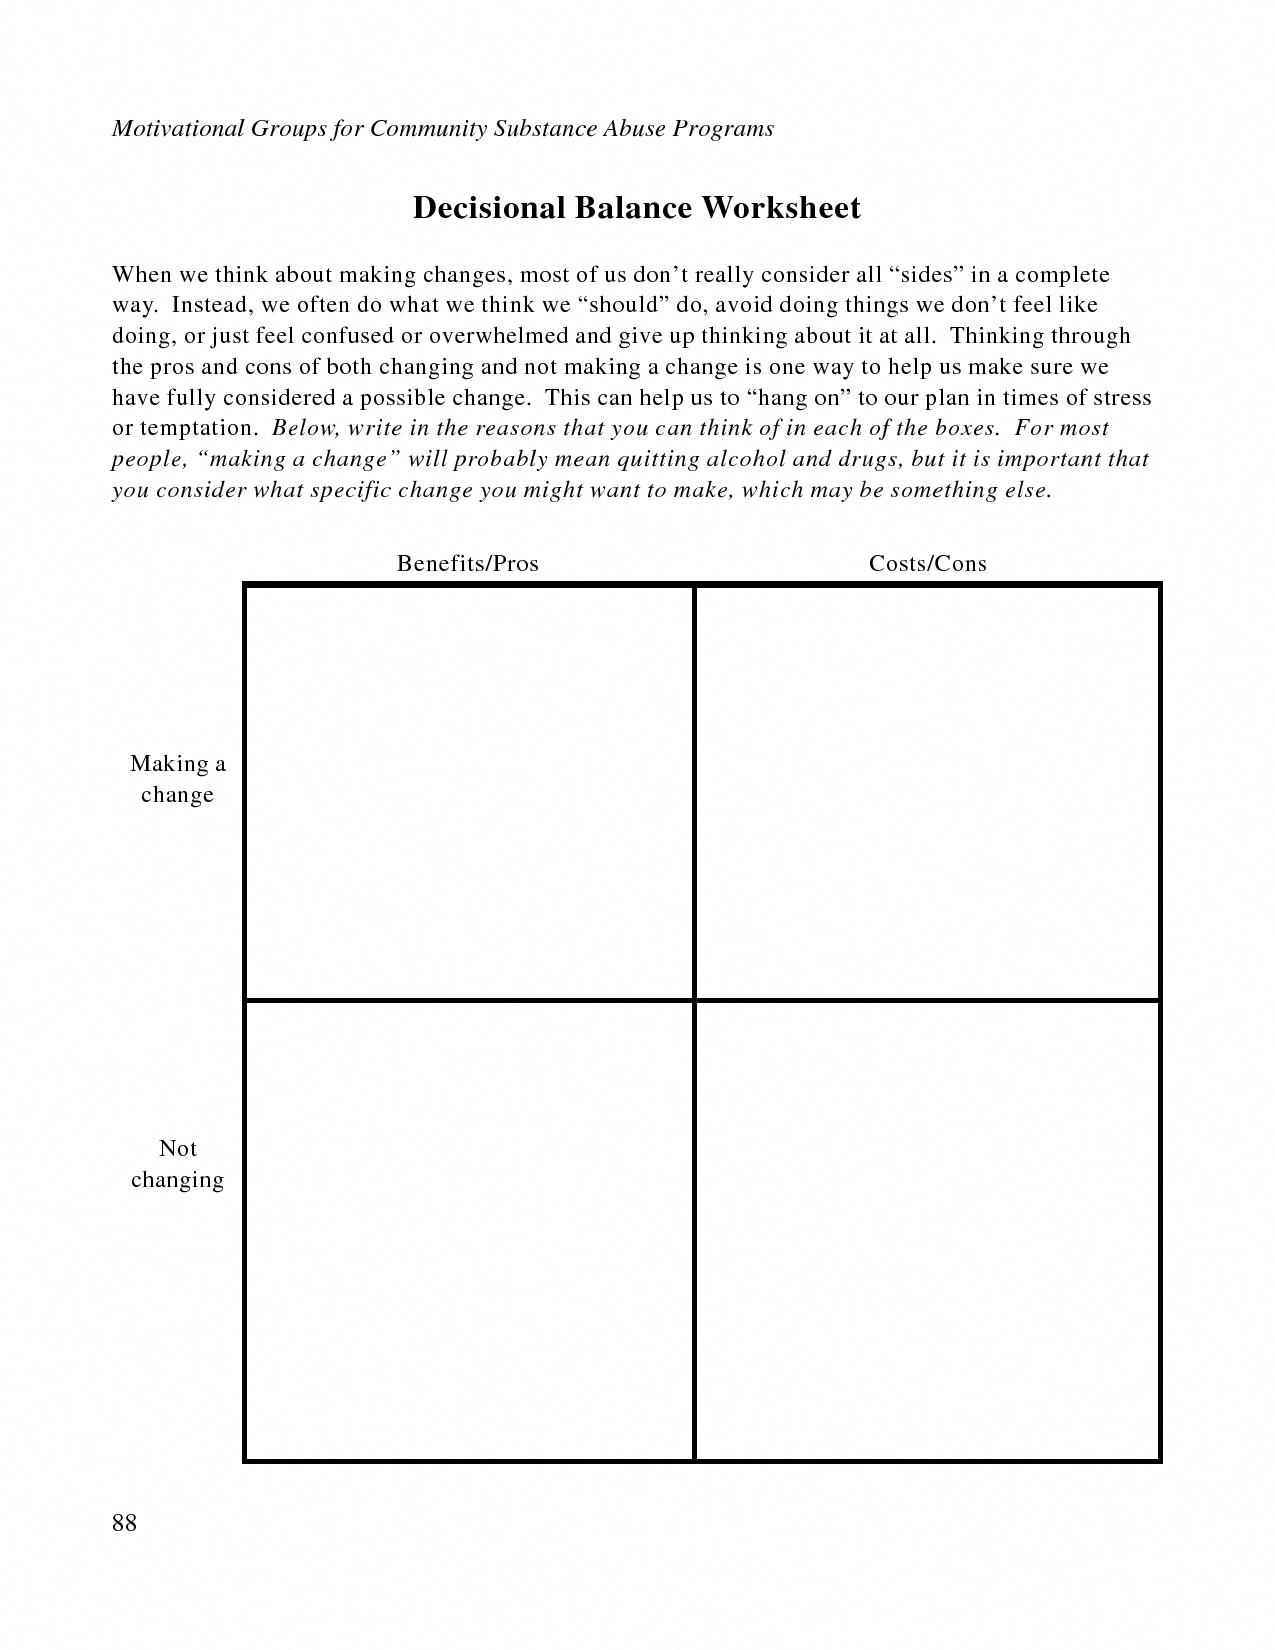 free printable dbt worksheets   Decisional Balance ...